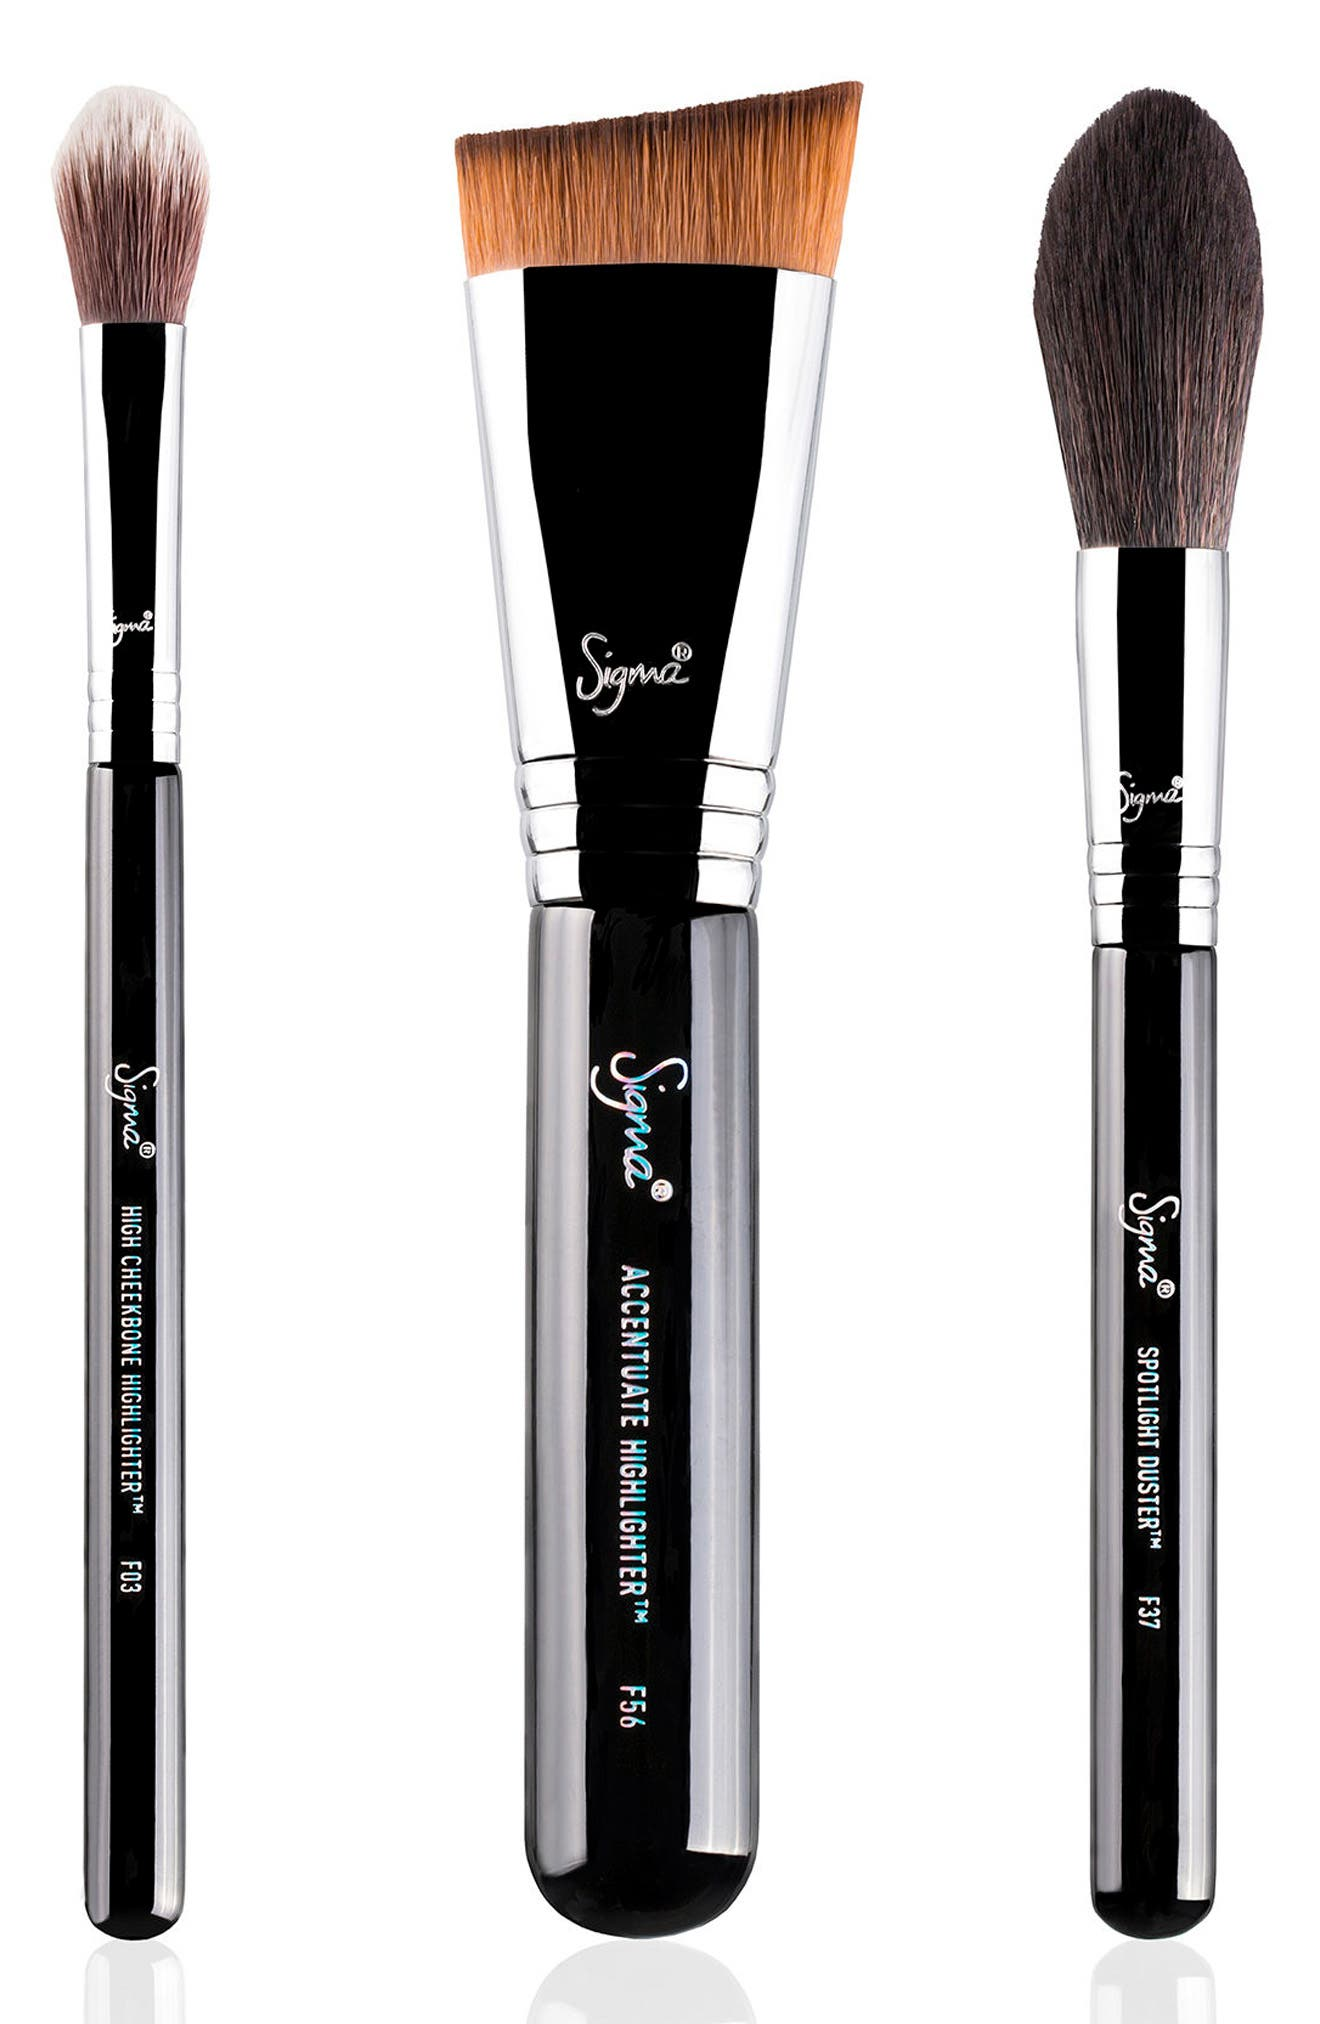 Alternate Image 1 Selected - Sigma Beauty Highlight Expert Brush Set ($68 Value)